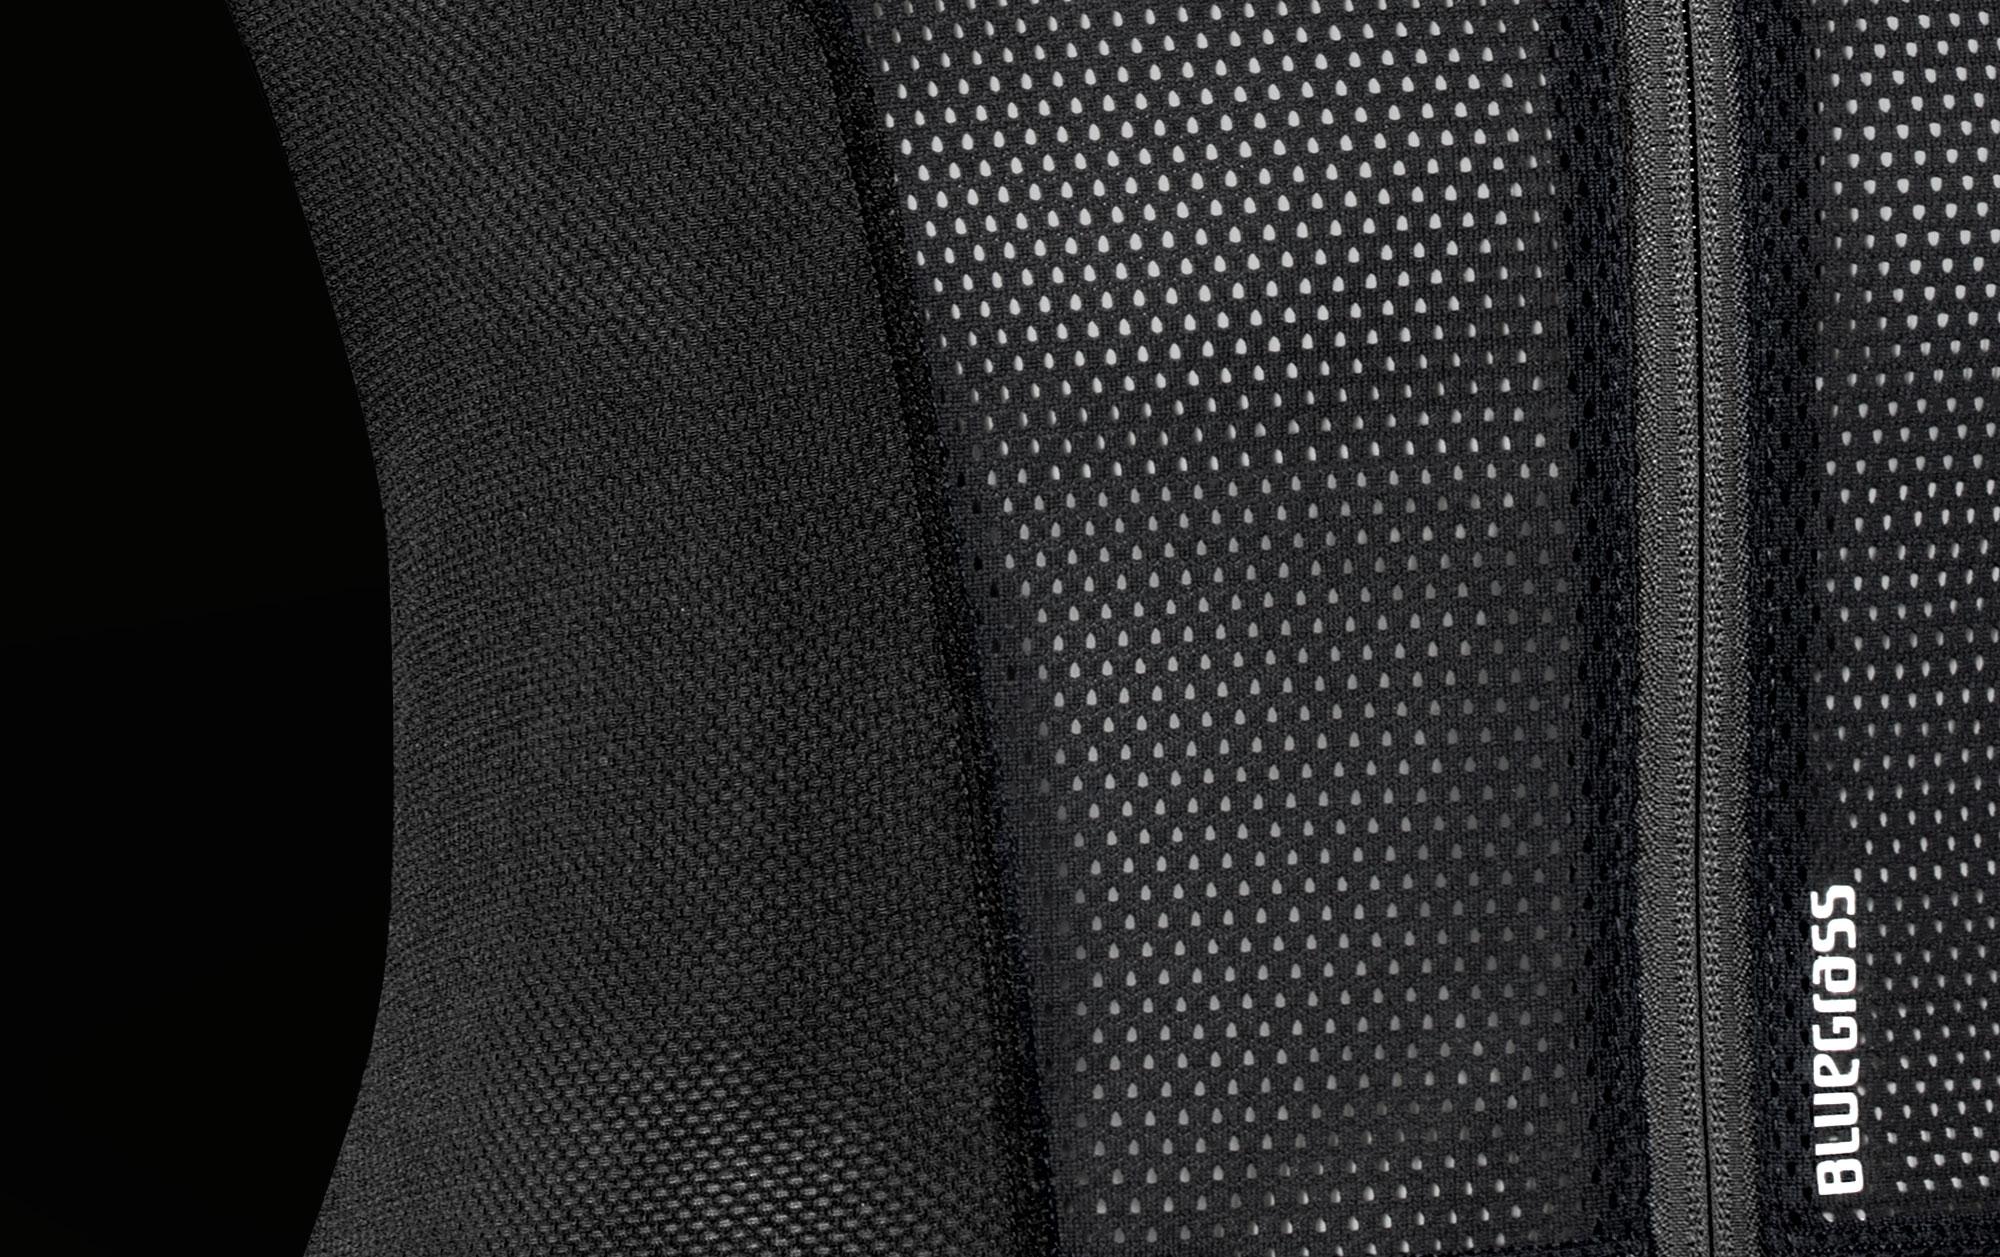 BLUEGRASS Armour Lite, Body Protection made for Mountain Bike, Enduro and E-Bike Open Mesh Fabric